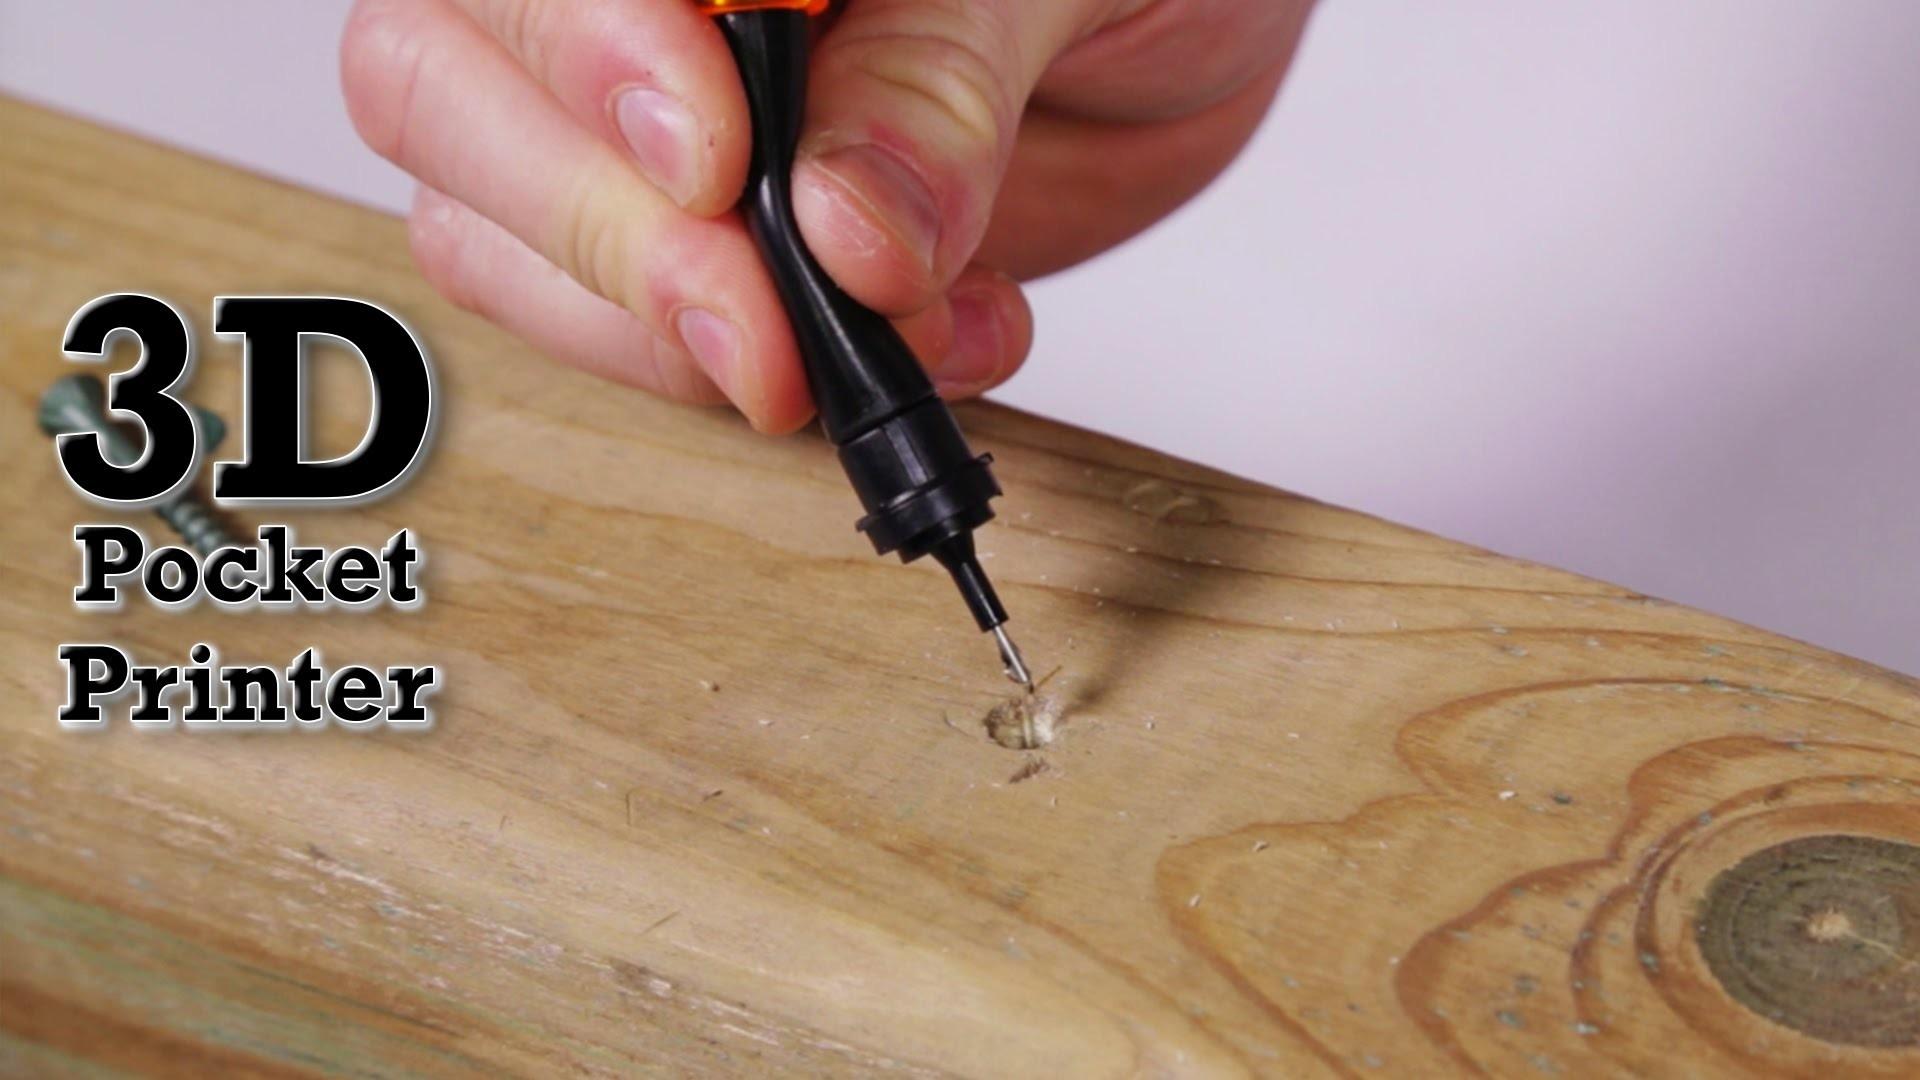 Bondic - How to Repair Stripped Screw Holes on Wood